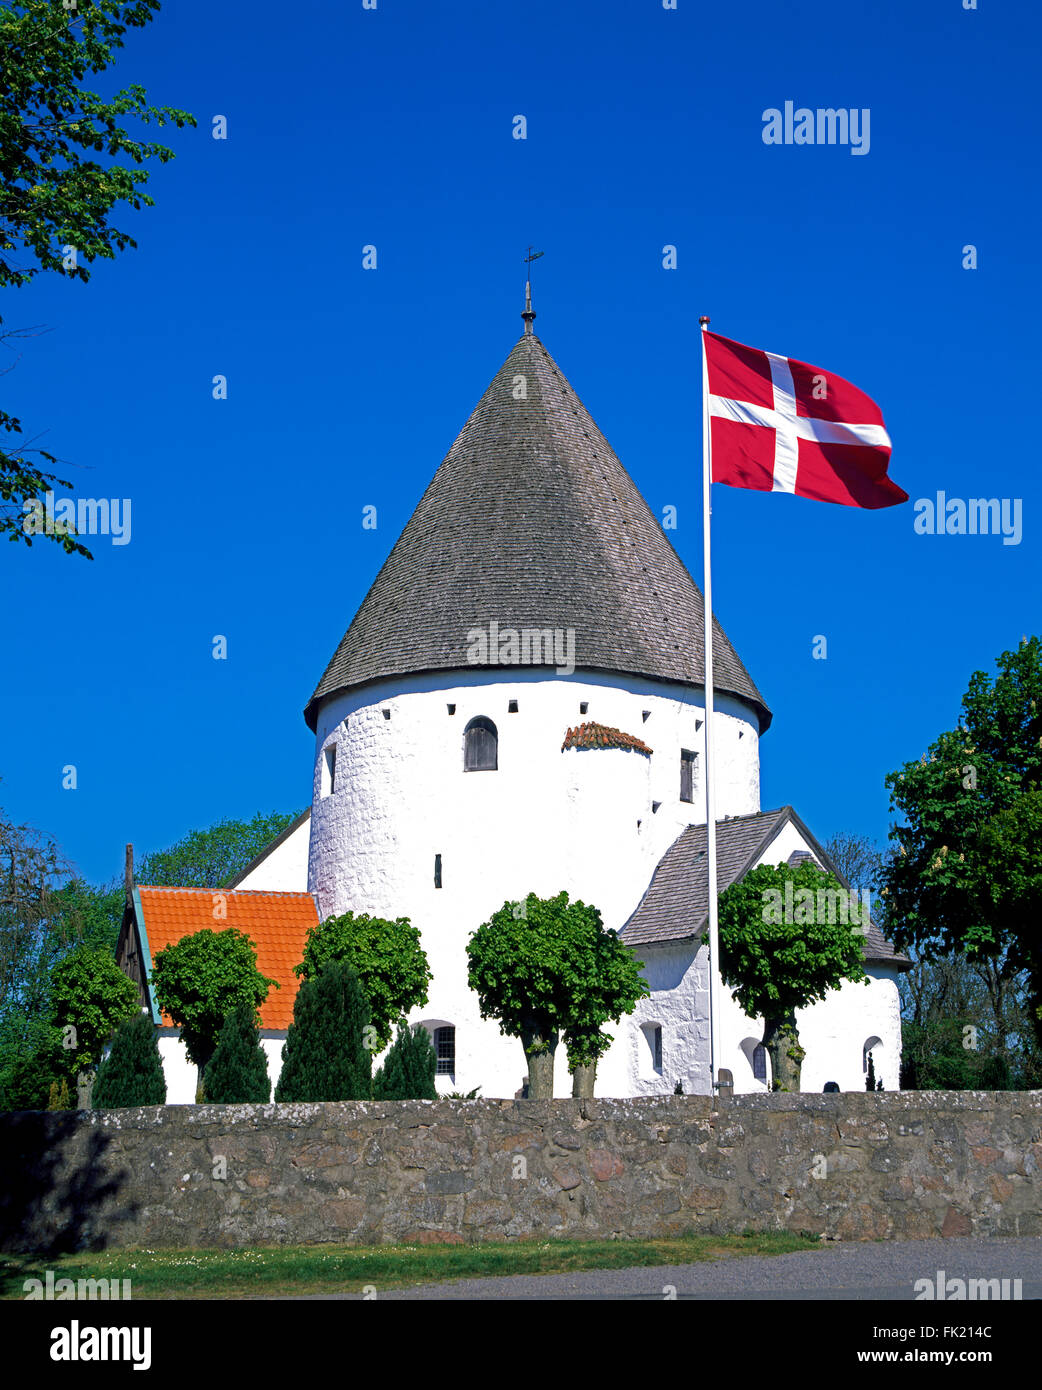 Round church Ols Kirke, Olsker, Bornholm island, Denmark, Scandinavia, Europe - Stock Image